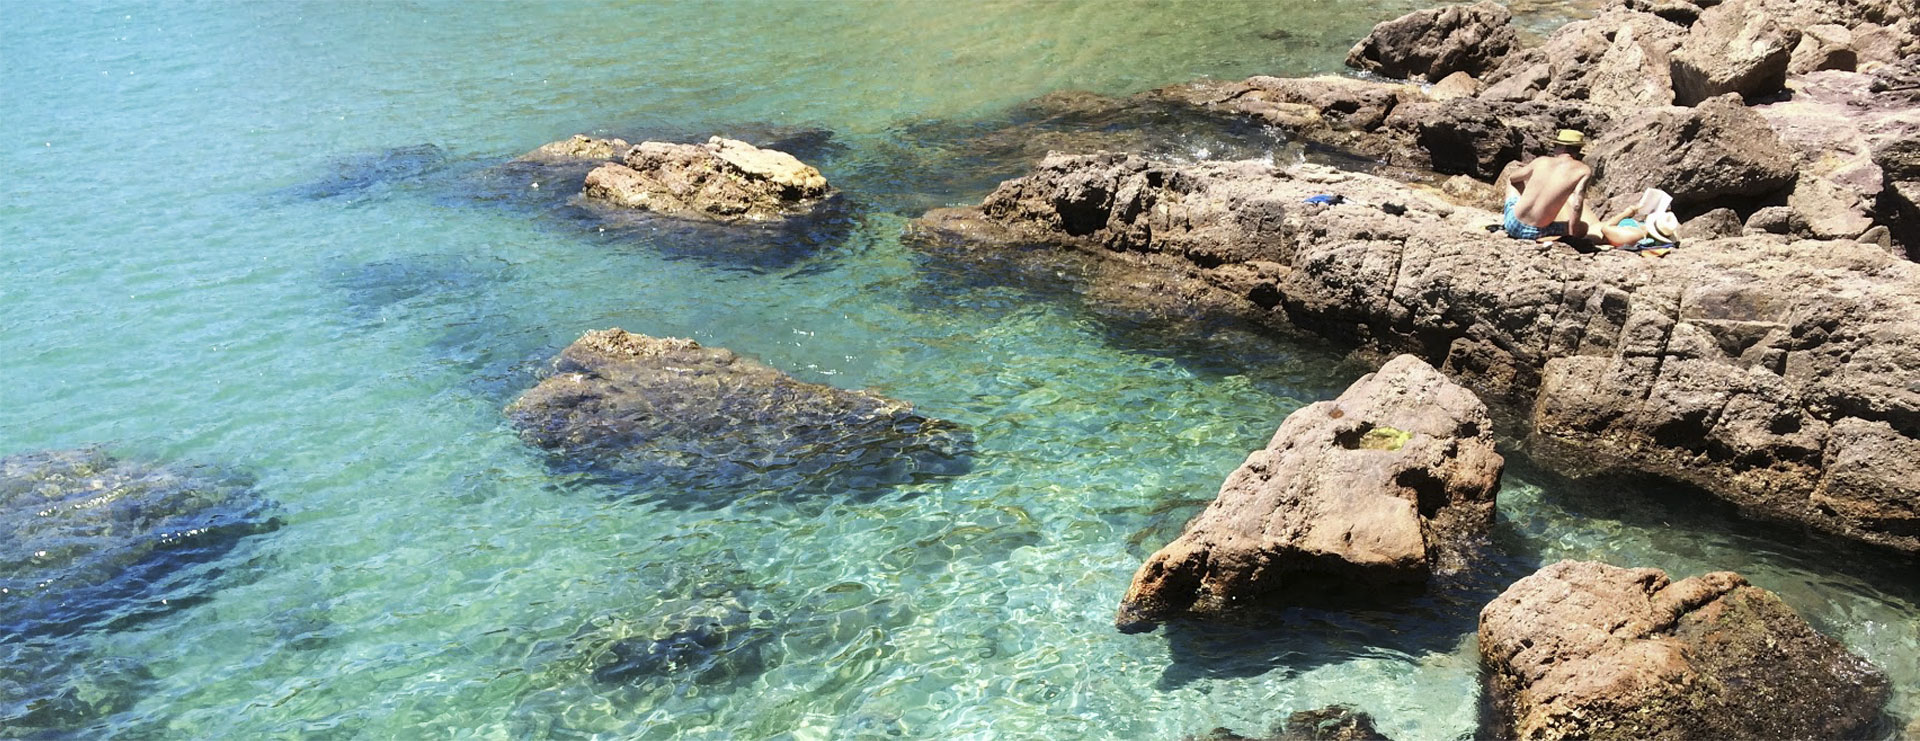 vacanze in toscana al mare